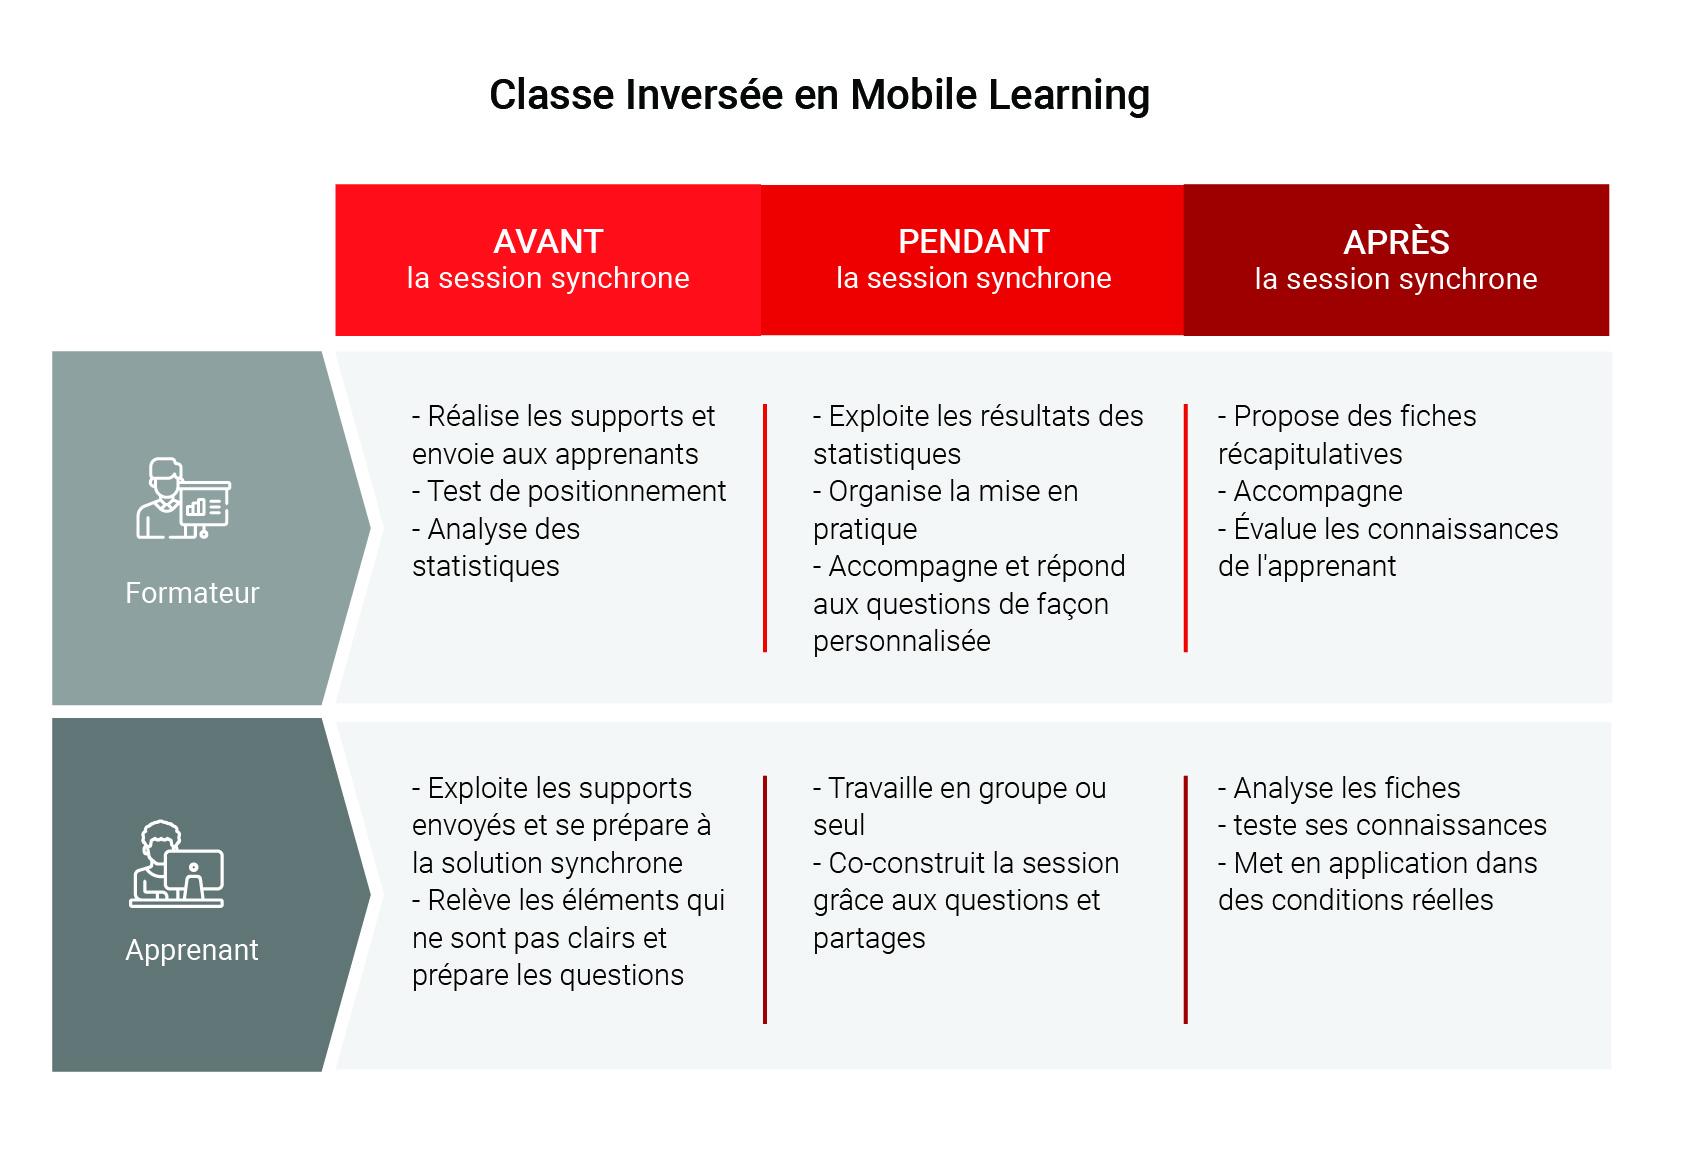 classe inversee en mobile learning